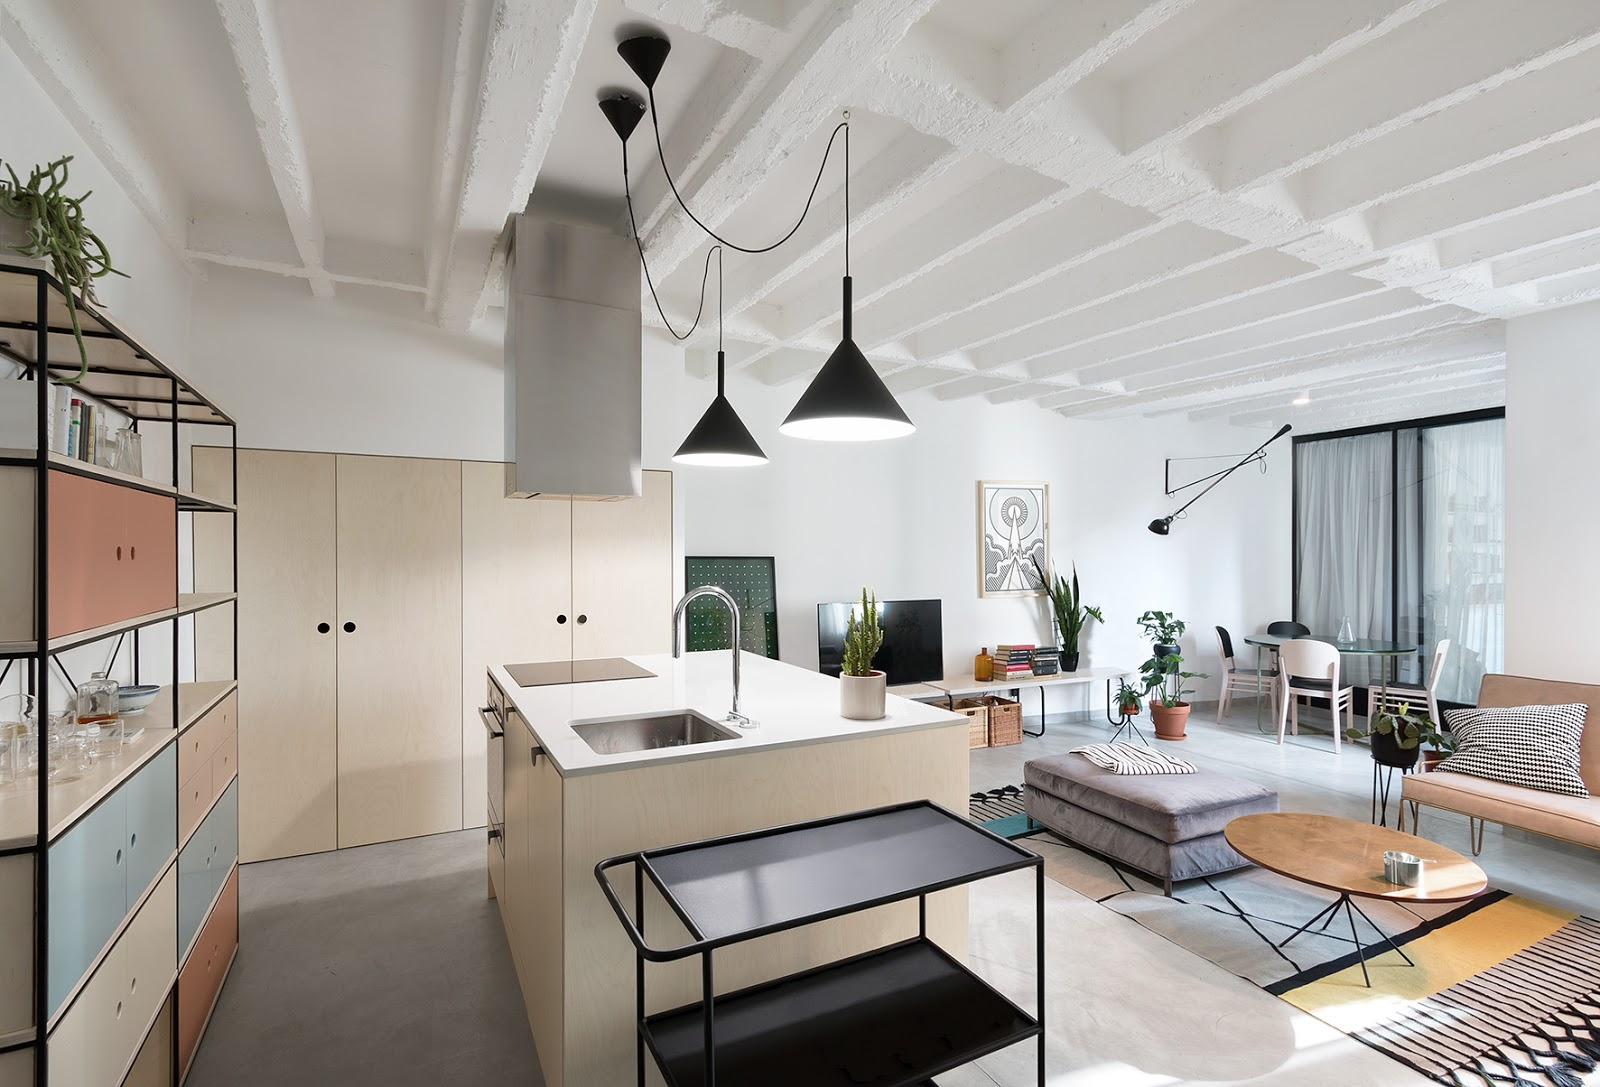 Appartamento moderno dalle linee pulite a belgrado by for Appartamento moderno